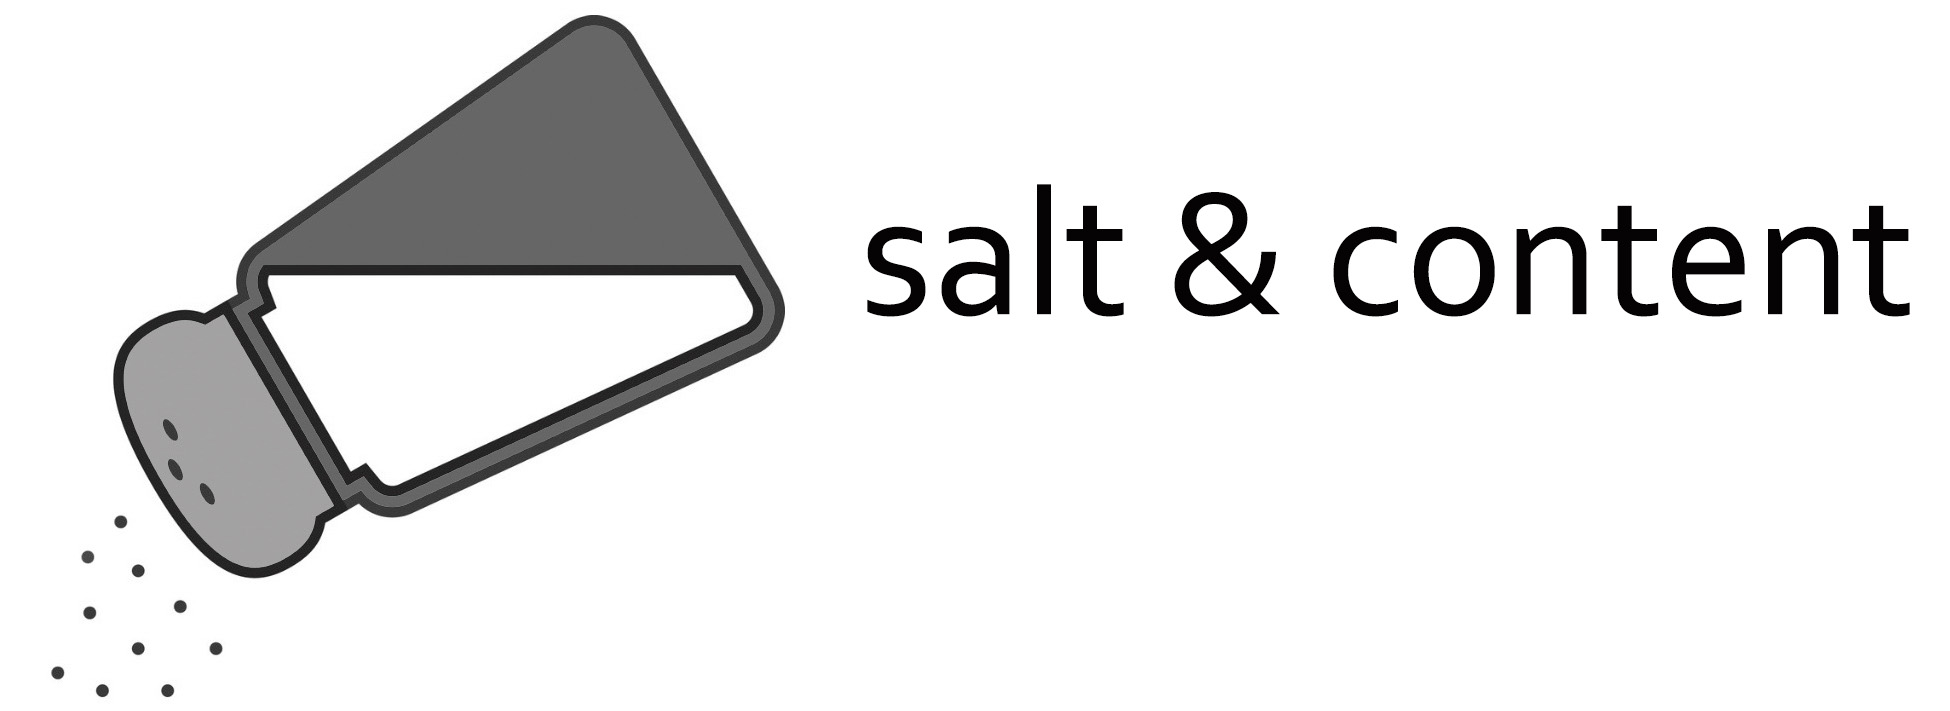 salt & content